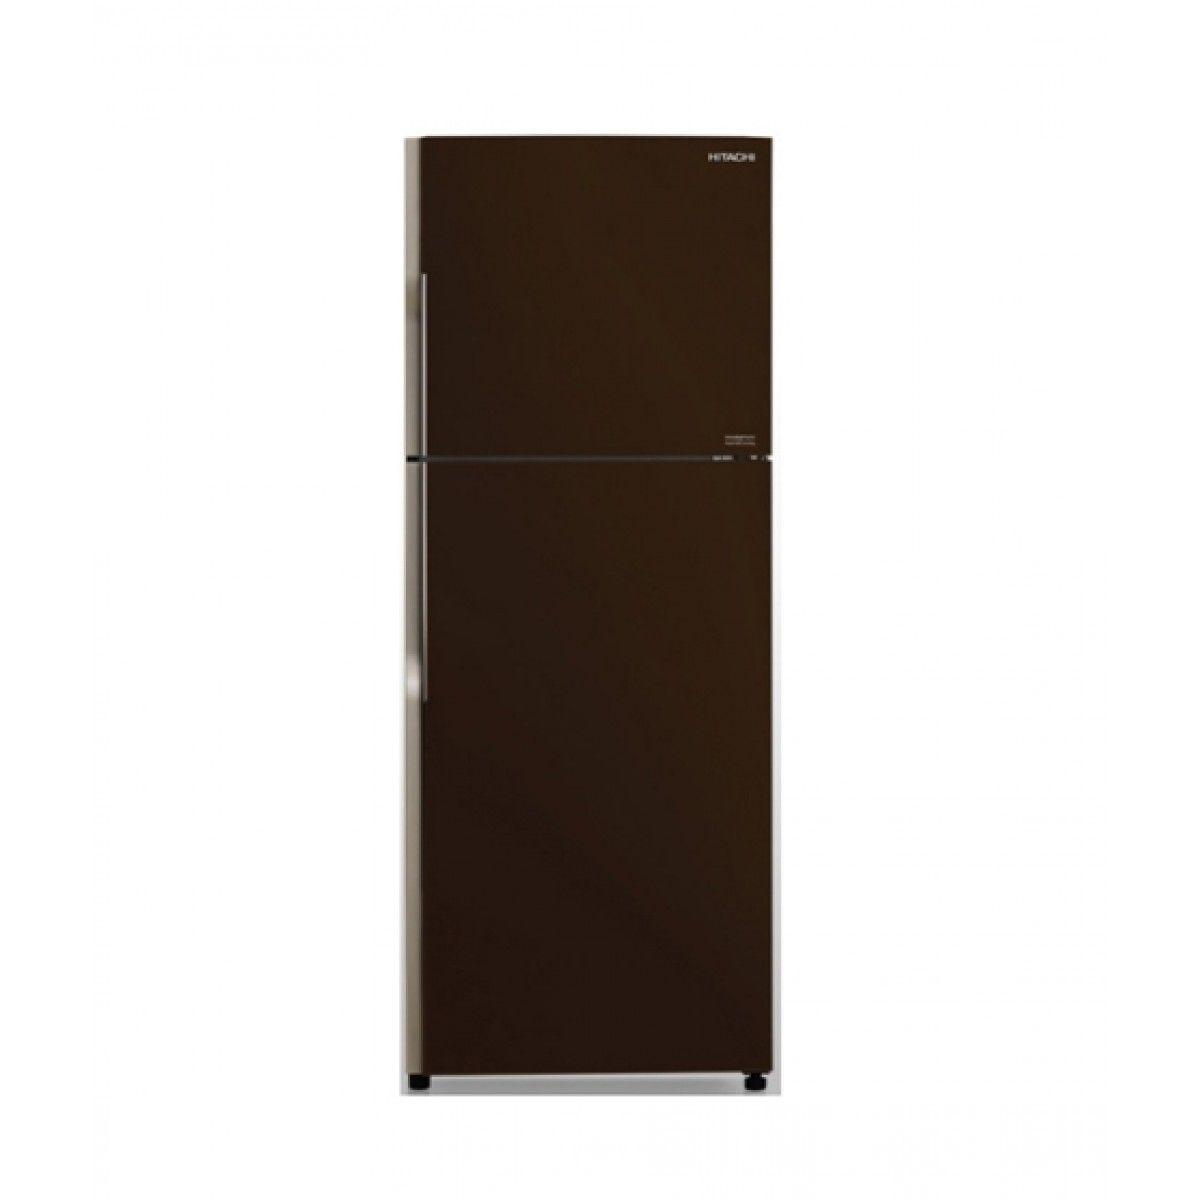 Hitachi (R-VG490P3PB) Freezer-on-Top 16 cu ft Refrigerator Brown